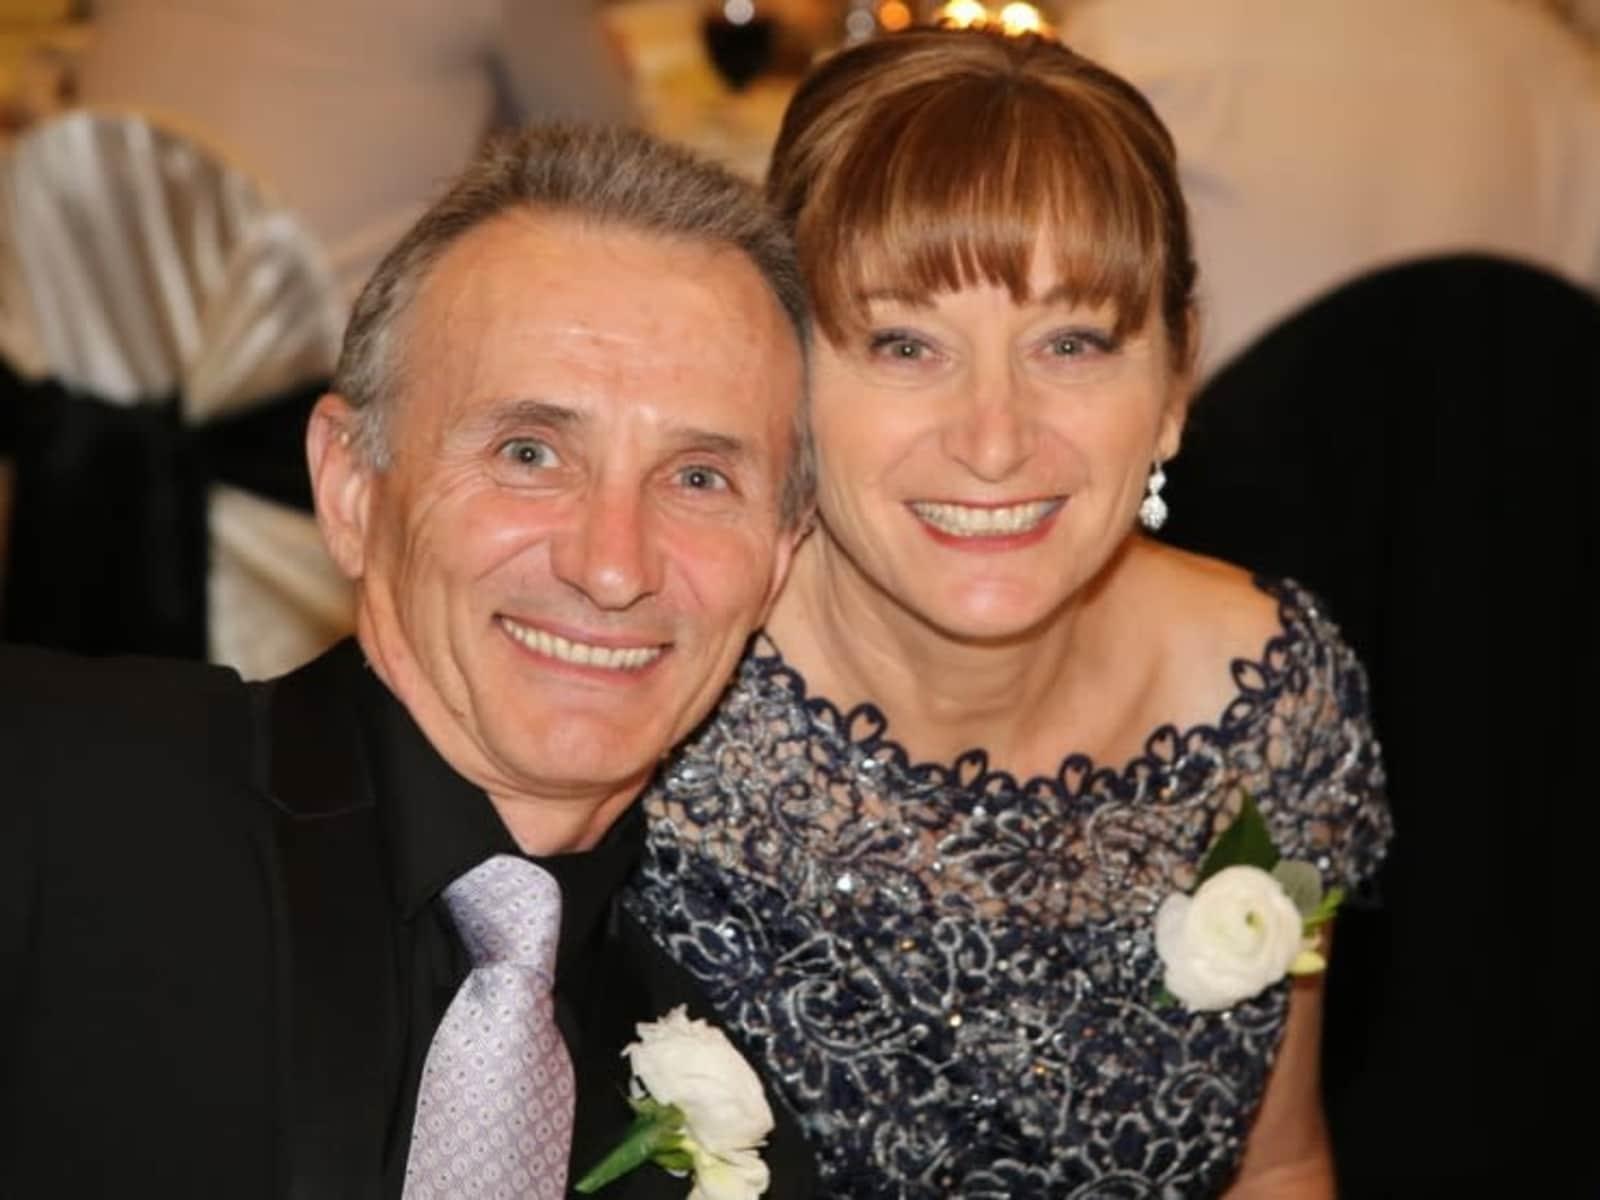 Karen & John from Joondalup, Western Australia, Australia